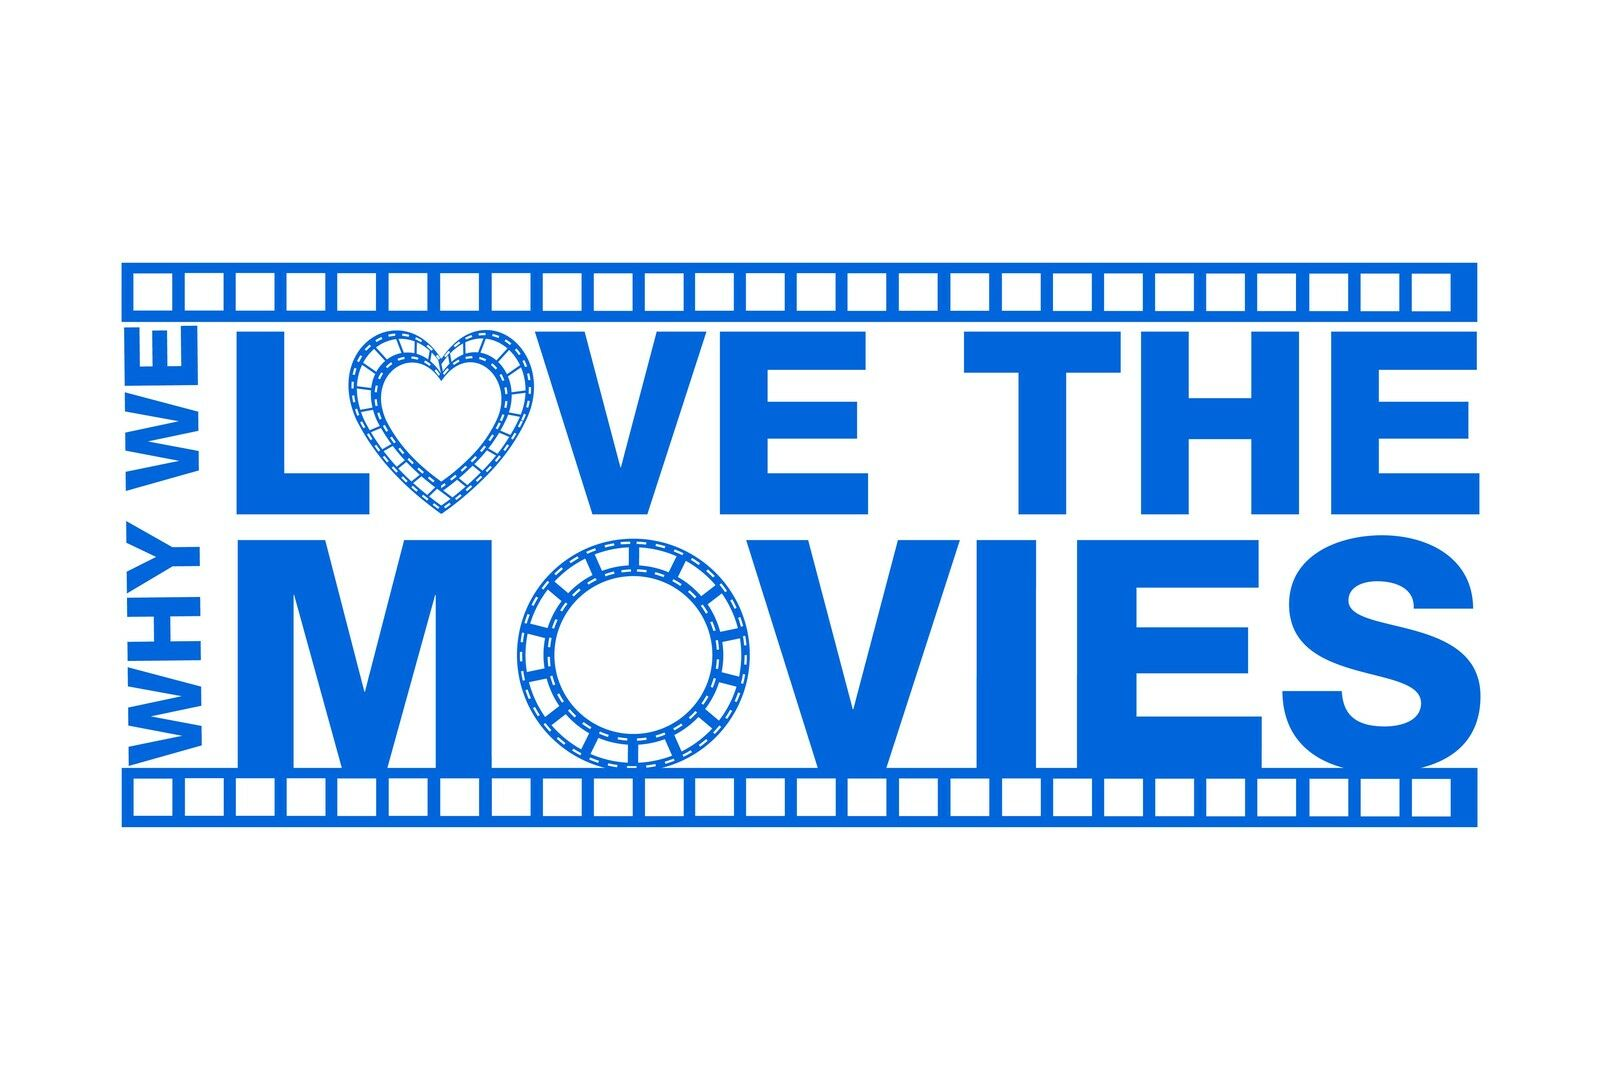 STEVE'S MOVIE AND TV MEMOROBILIA